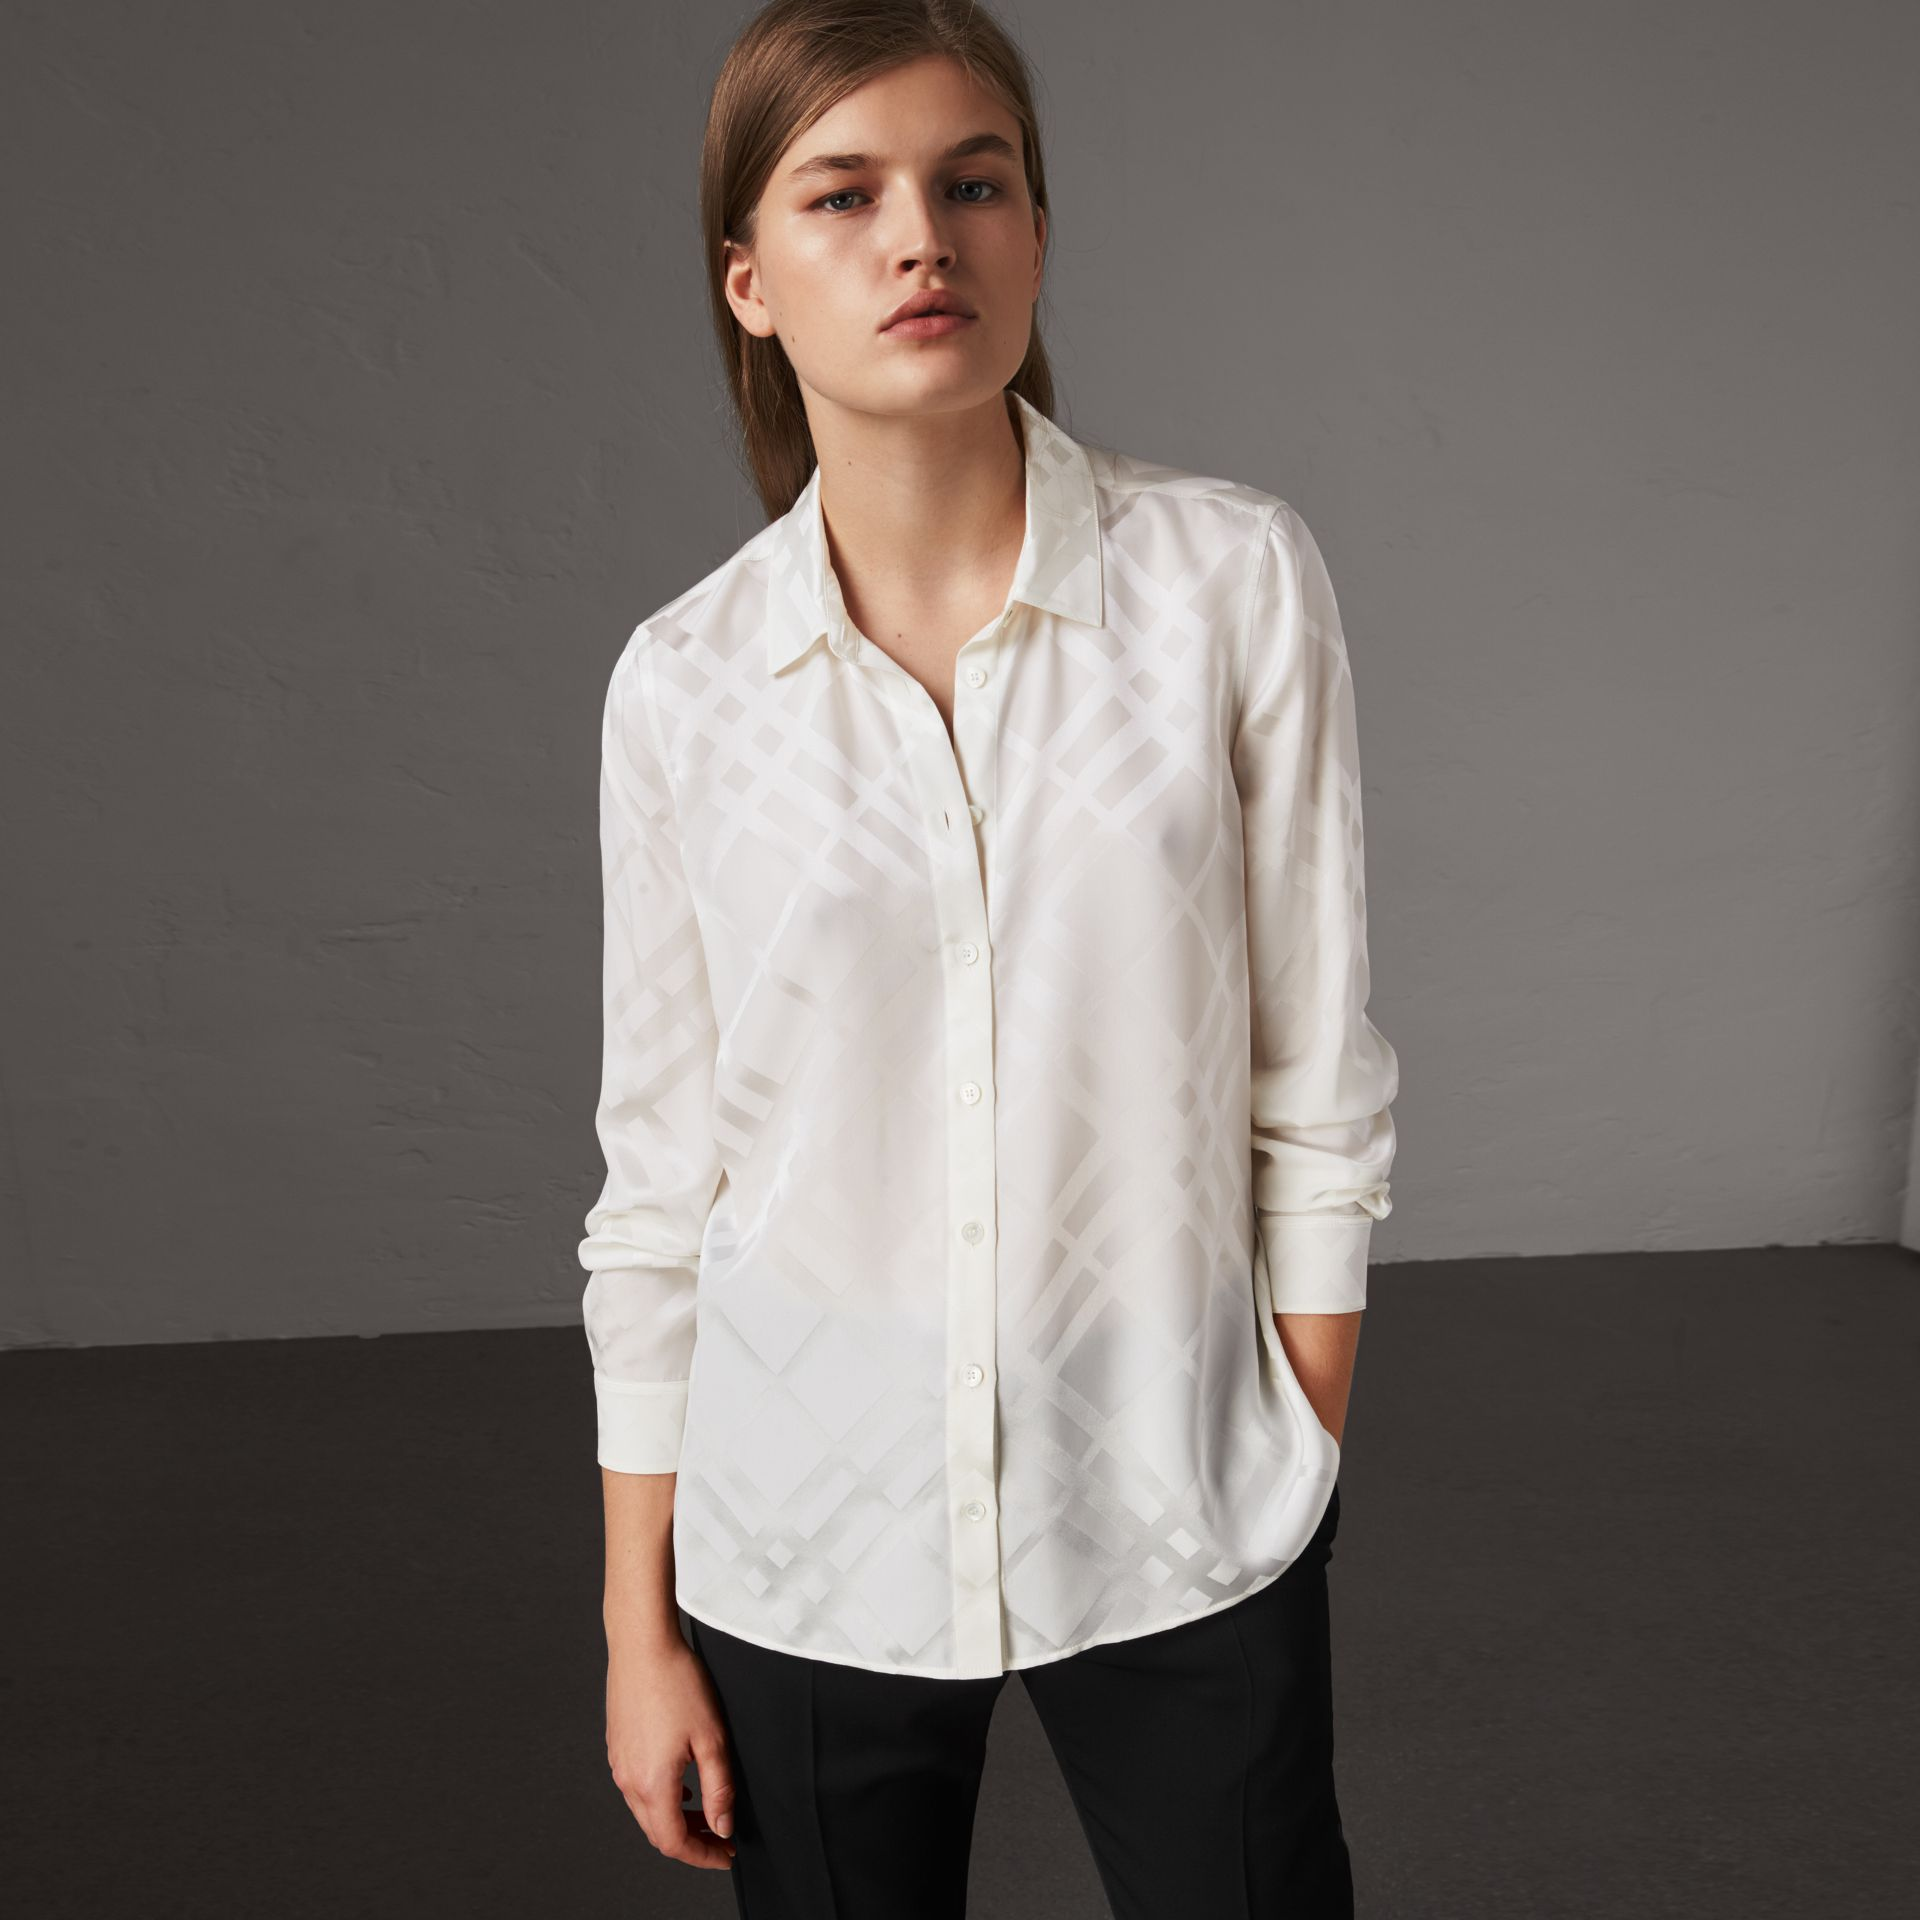 Tonal Check Silk Shirt in White - Women | Burberry Canada - gallery image 1